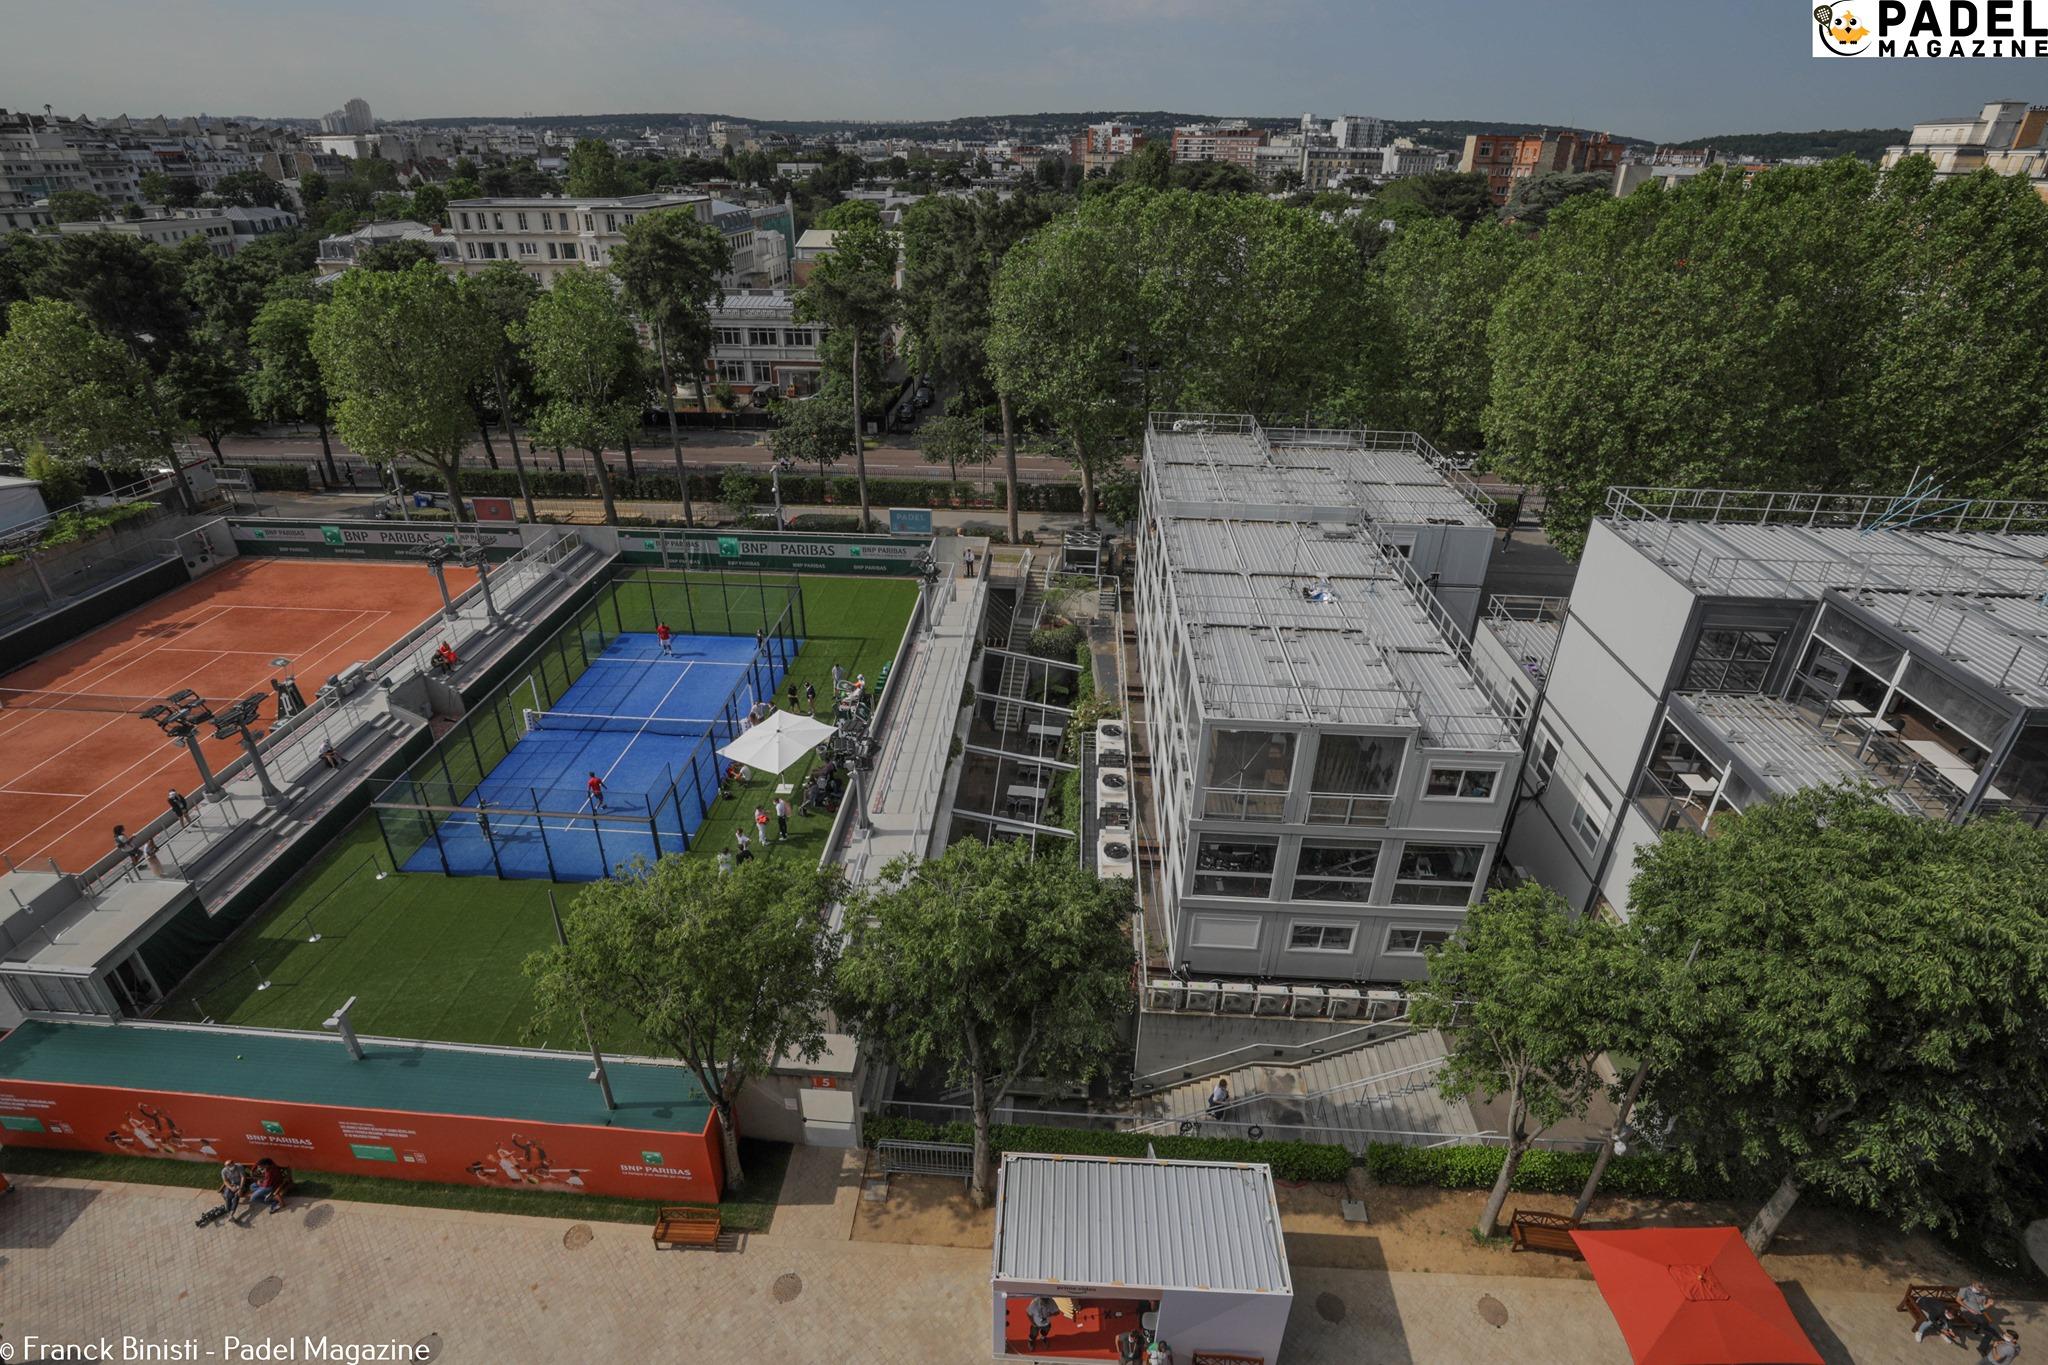 maasto padel Roland Garros